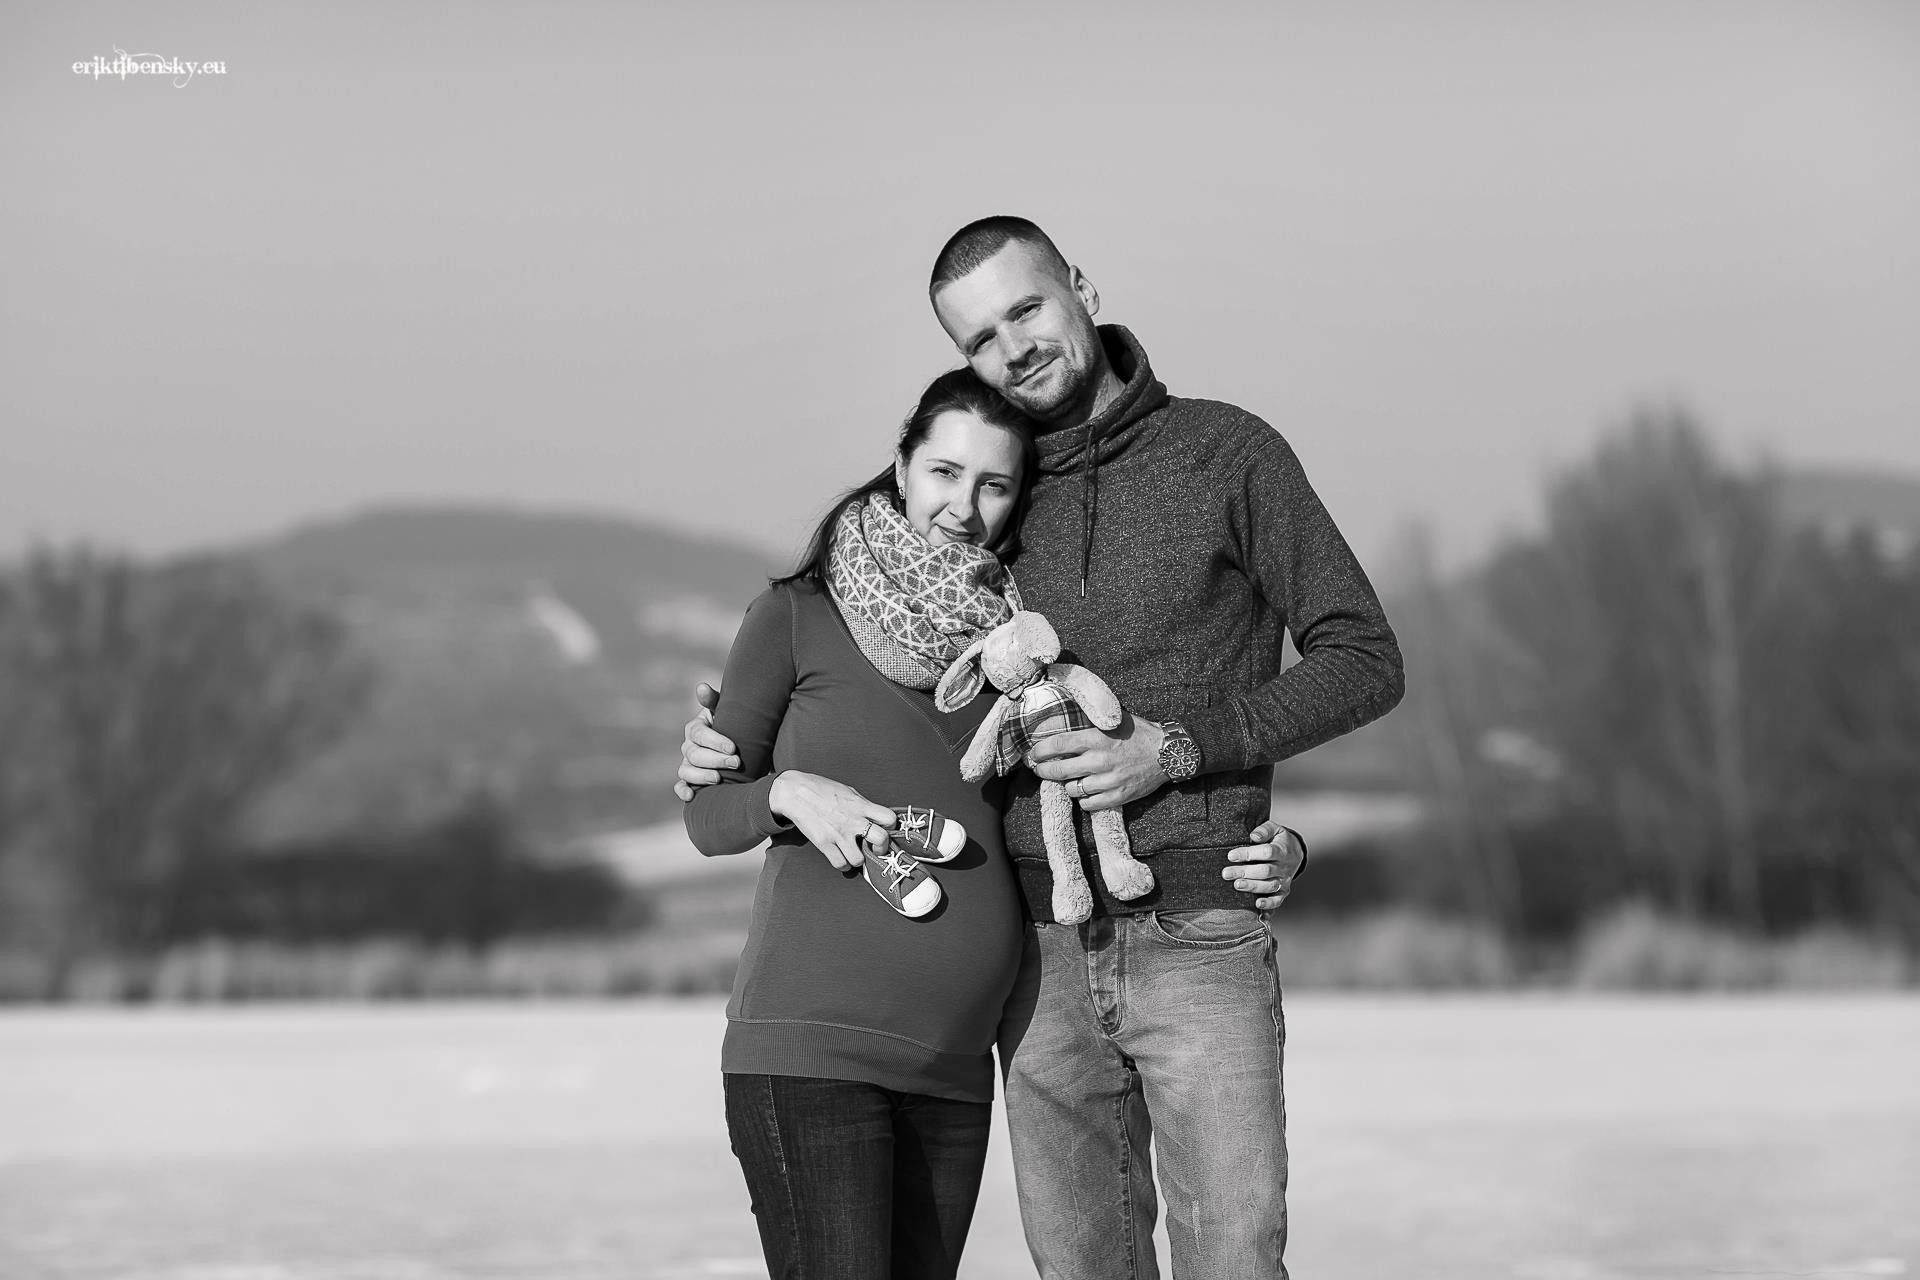 eriktibensky.eu-fotograf-tehotenske-fotografovanie-pezinok-bratislava-portretny-umelecky-wb-1006